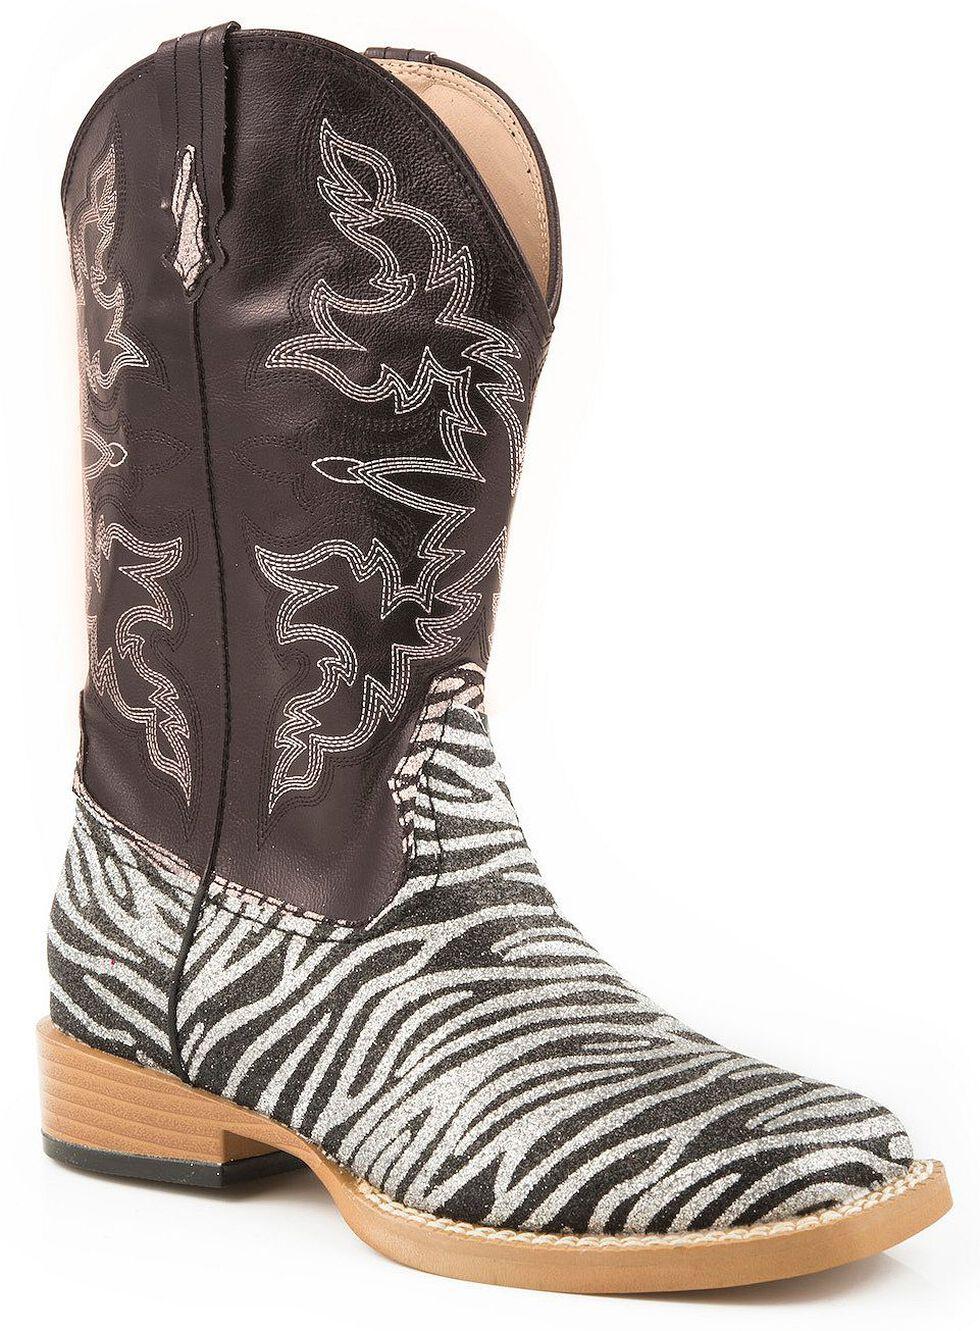 Roper Girls' Glittery Zebra Print Cowgirl Boots - Square Toe, Zebra, hi-res